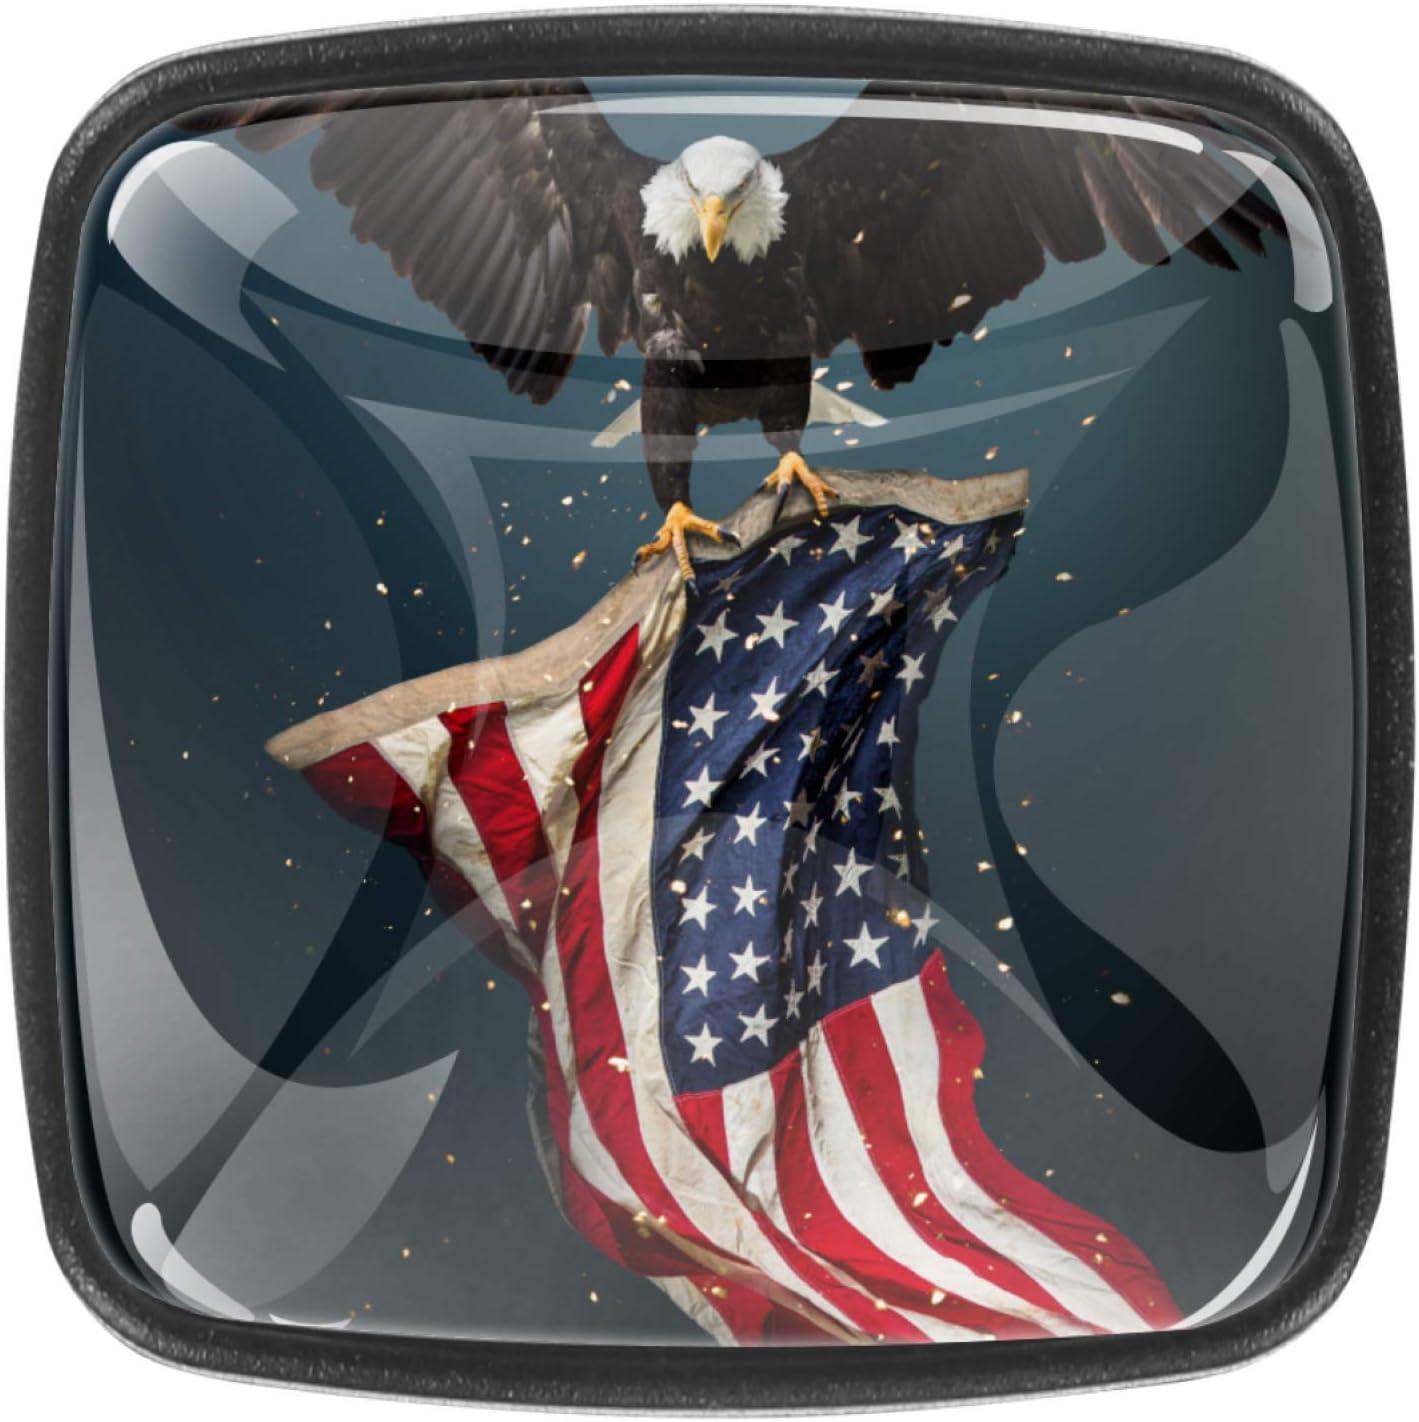 Kitchen Cabinet Knobs - American Flag Eagle - 1.18 Inch Round Drawer Handles - 4 Pack of Kitchen Cabinet Hardware